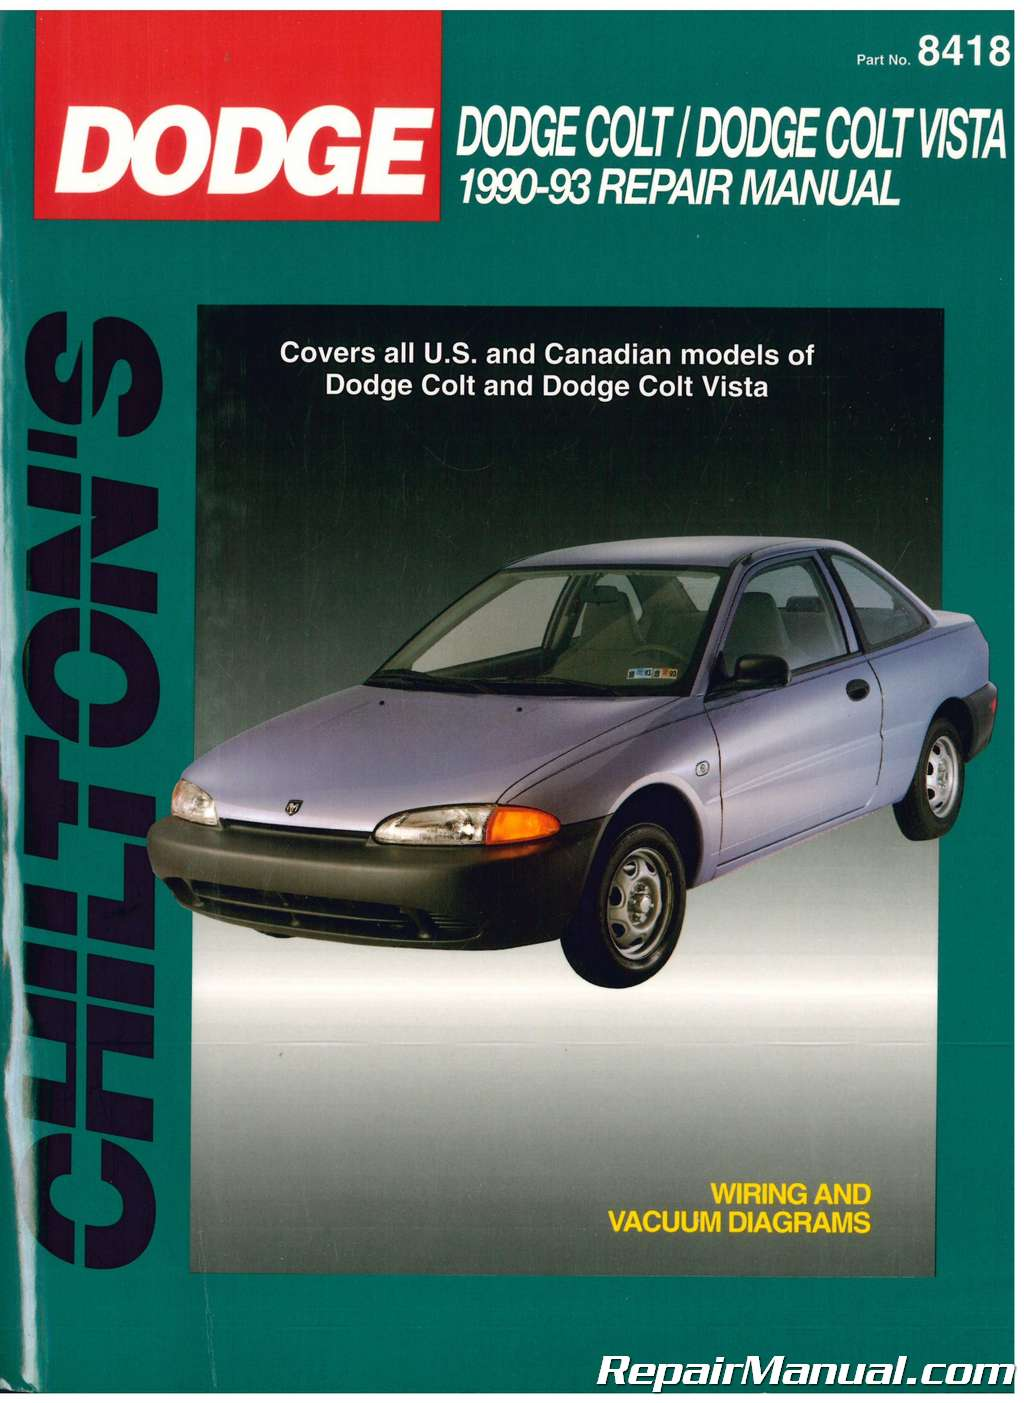 used chilton dodge colt dodge colt vista 1990 1993 repair manual rh repairmanual com 1990 Dodge Colt 1990 Plymouth Colt